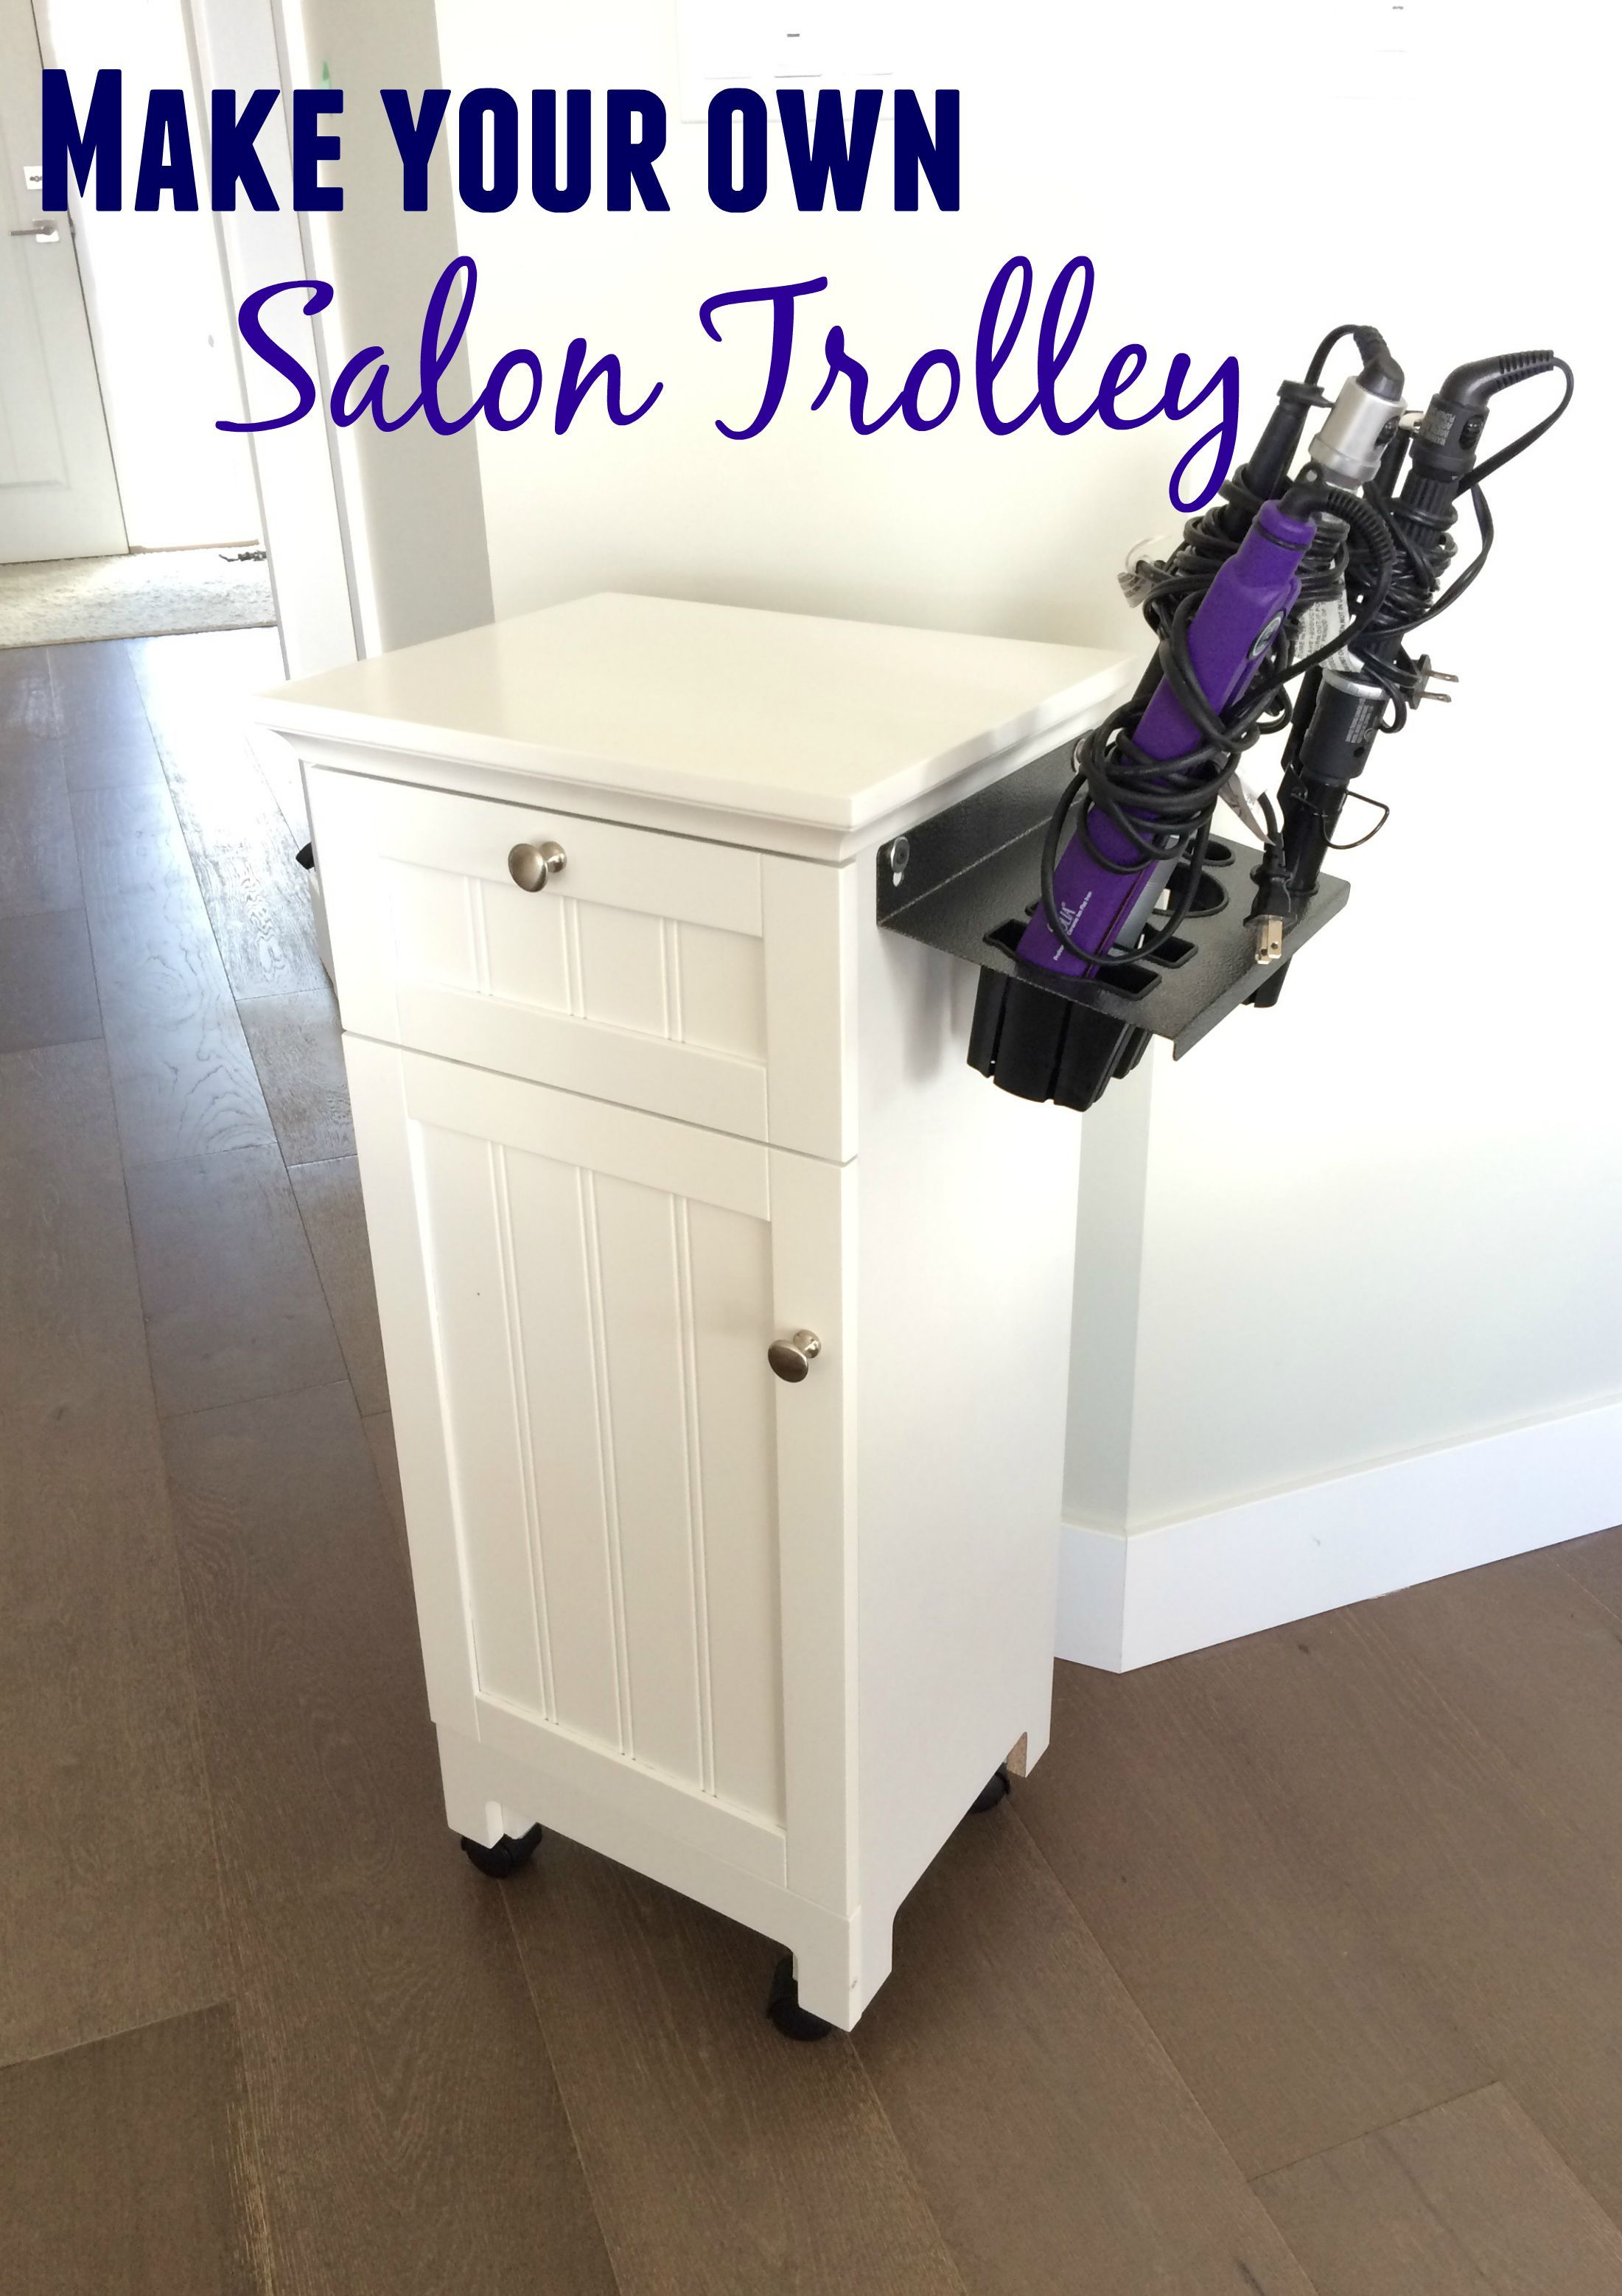 DIY Hair Trolley  Salon trolley, Salon suites decor, Salon decor